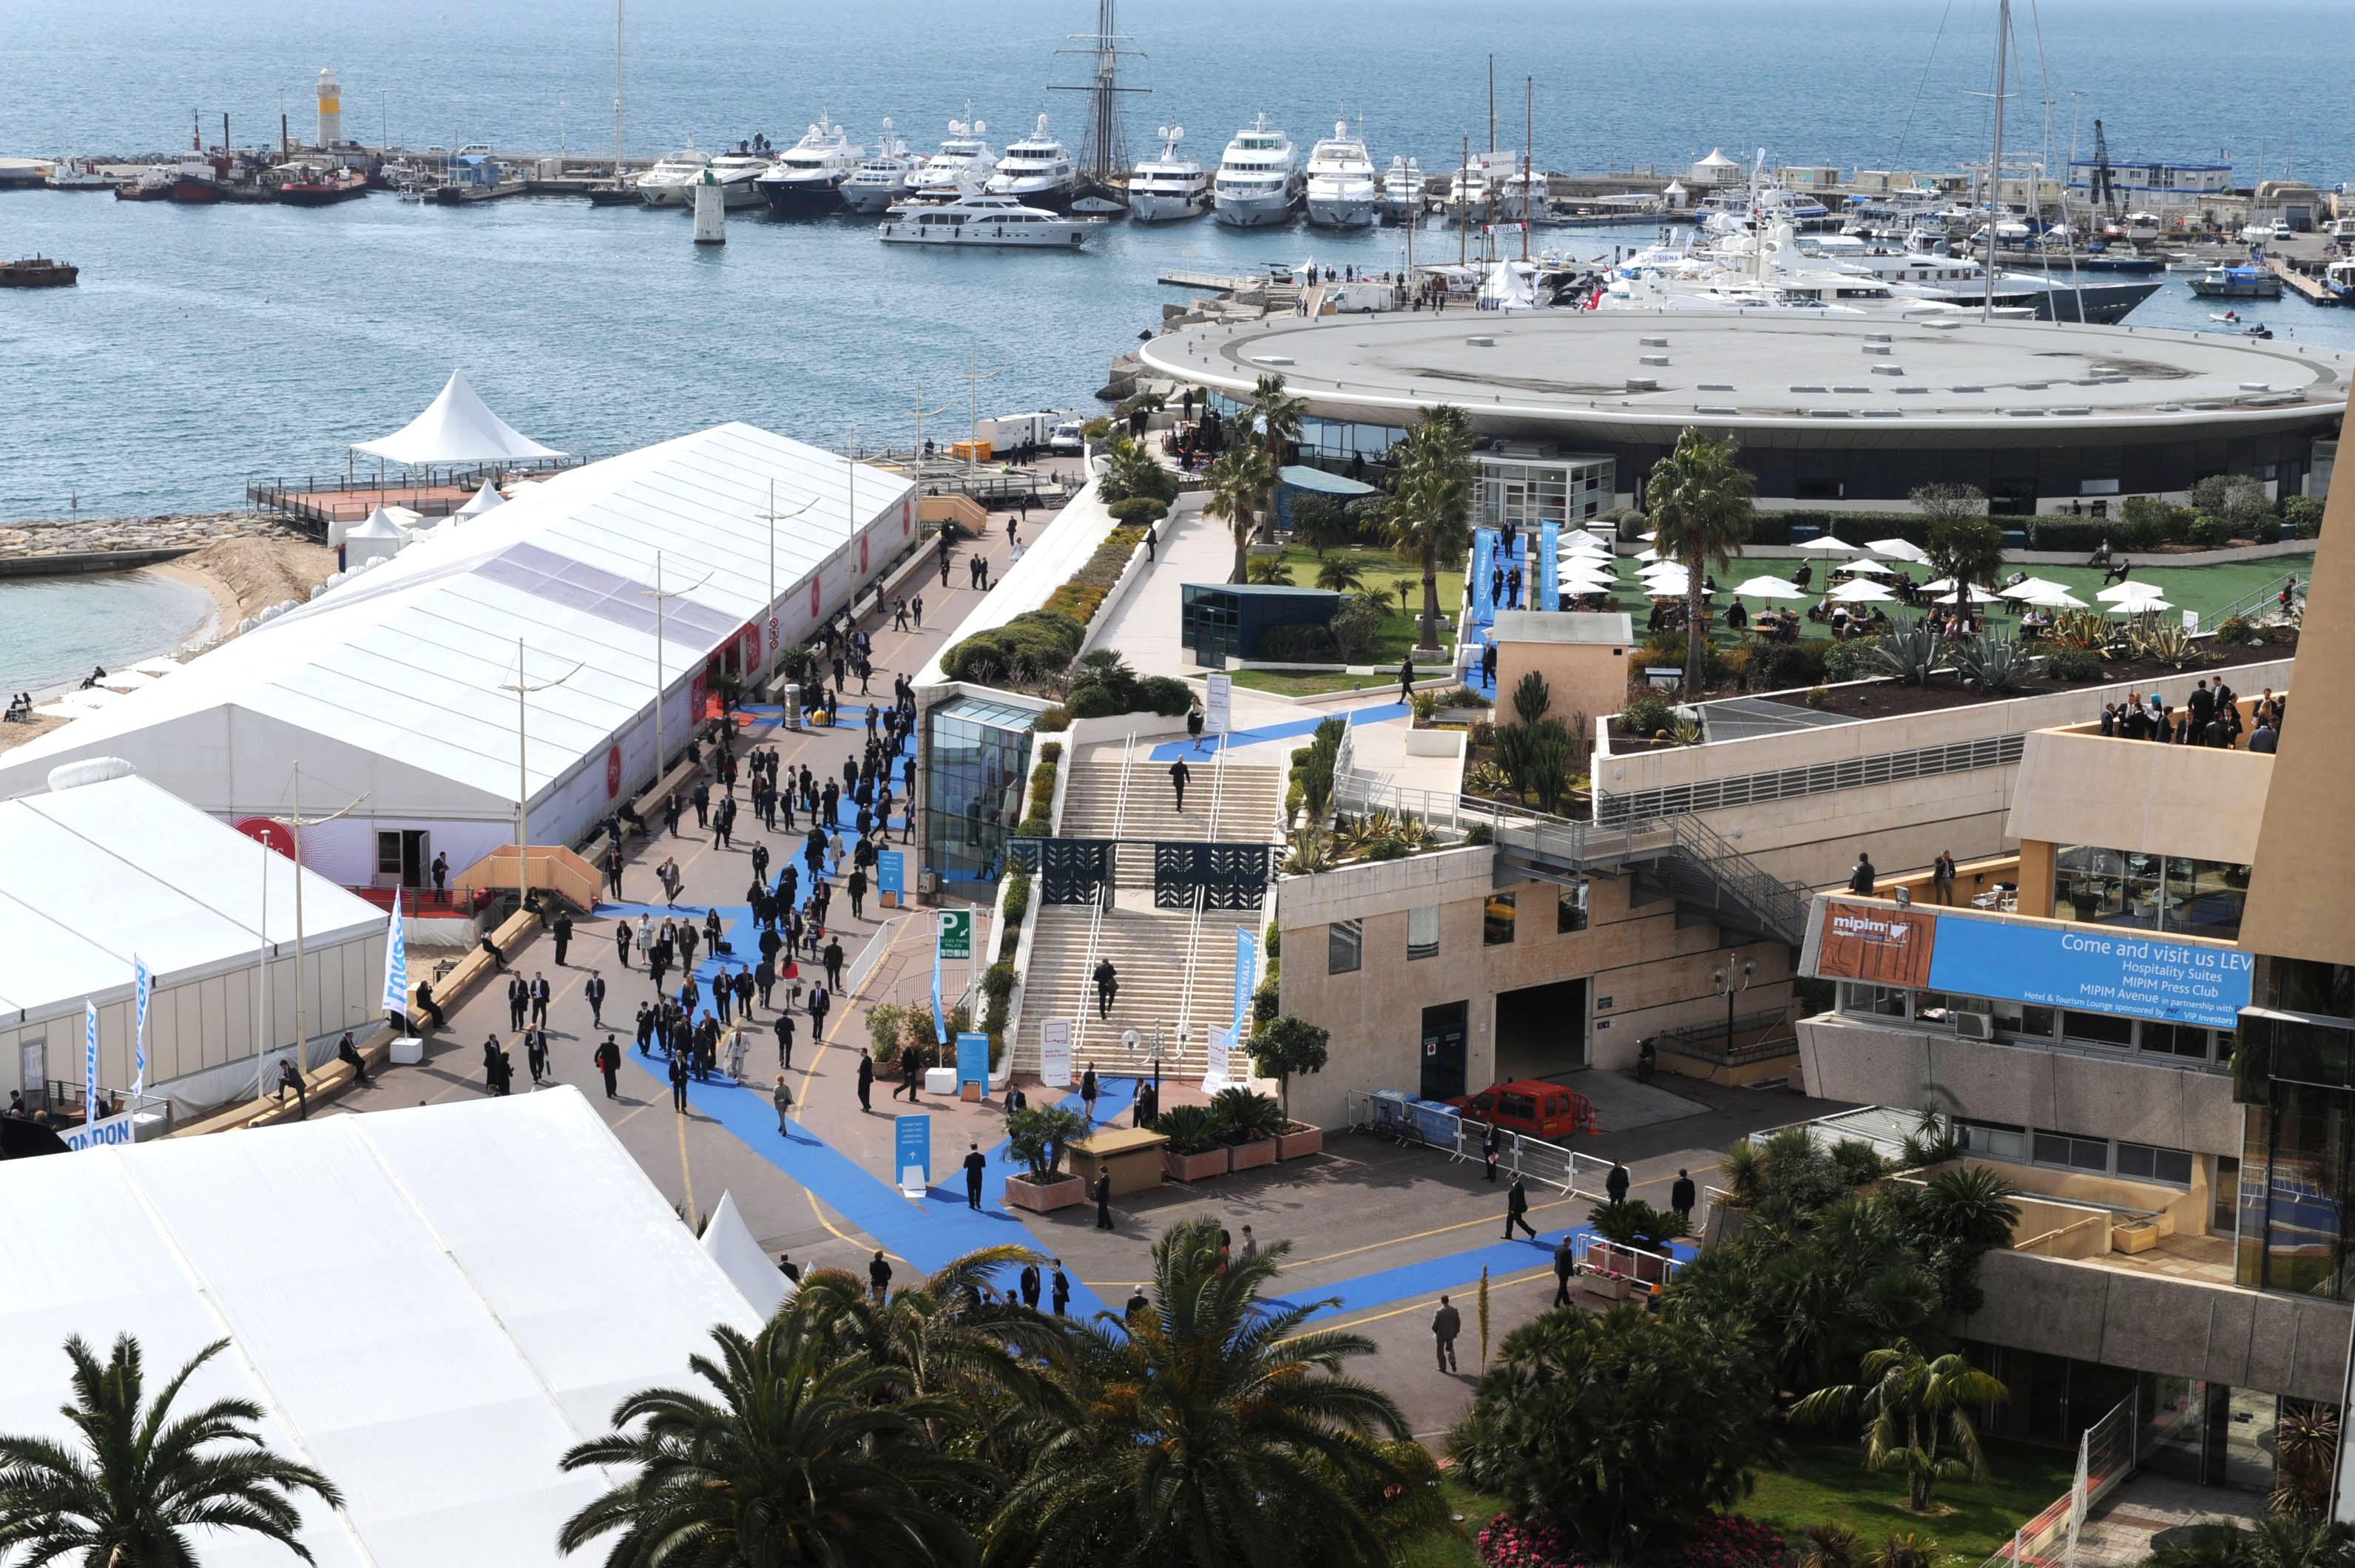 MIPIM Cannes 14/03-17/03